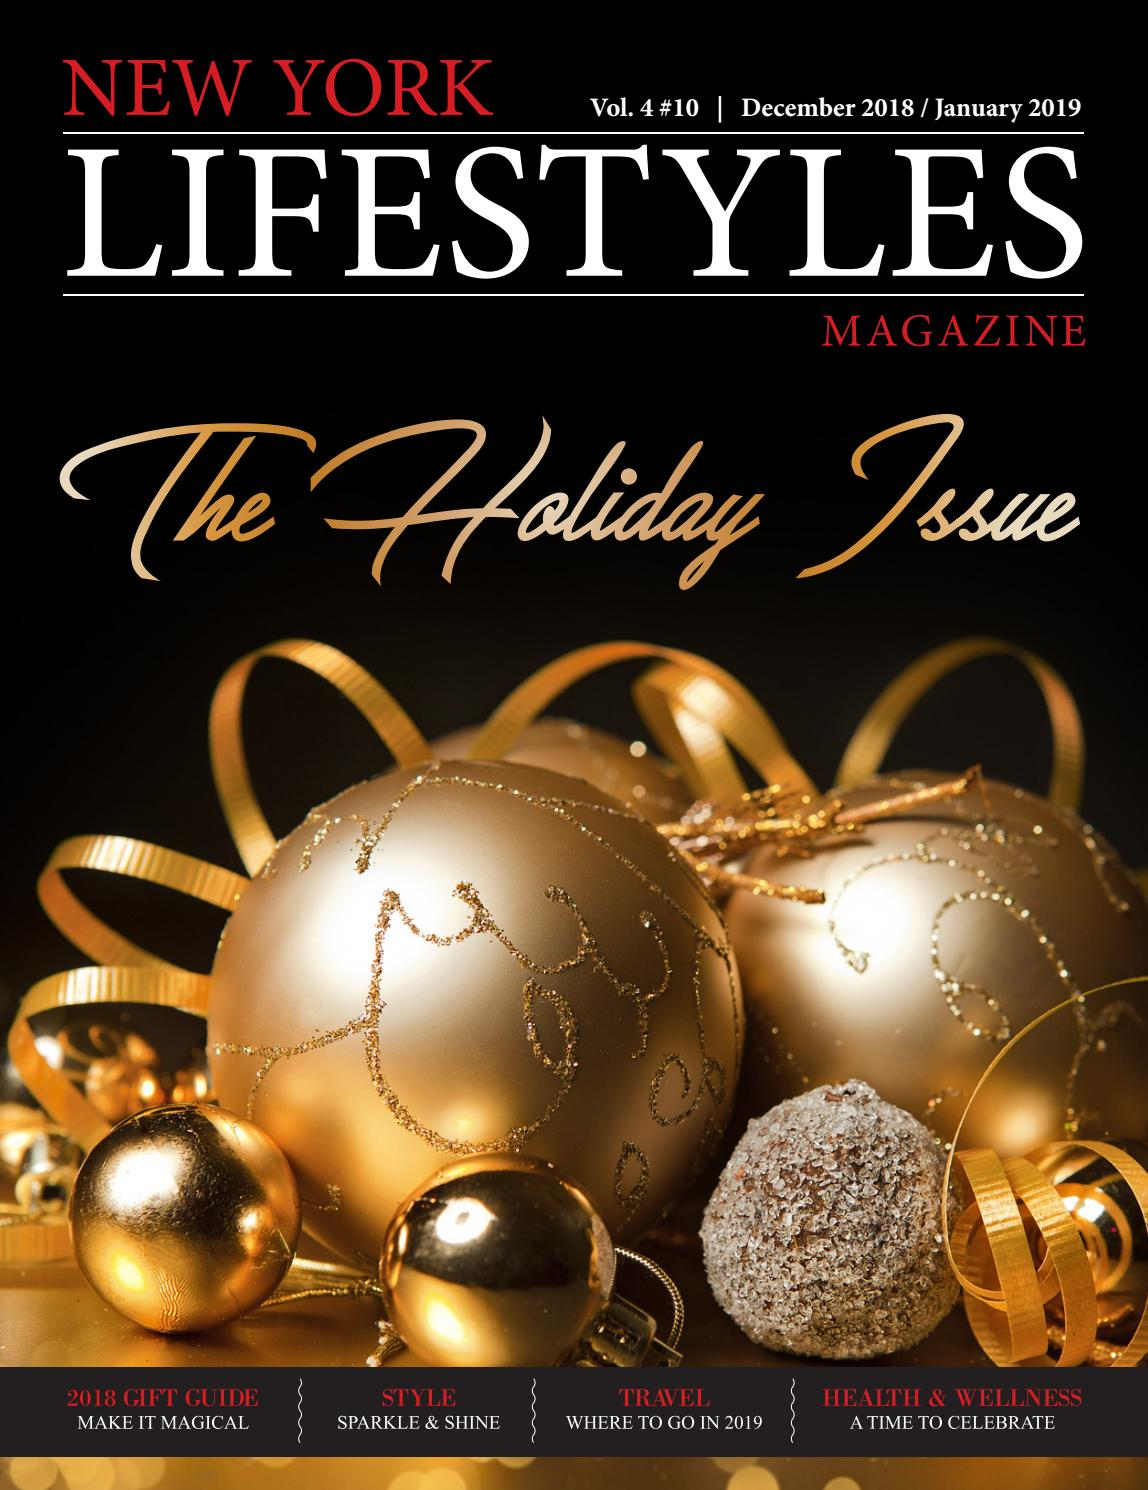 2cb7e7b86ddb New York Lifestyles Magazine - December 2018   January 2019 by New York  Lifestyles Magazine - issuu